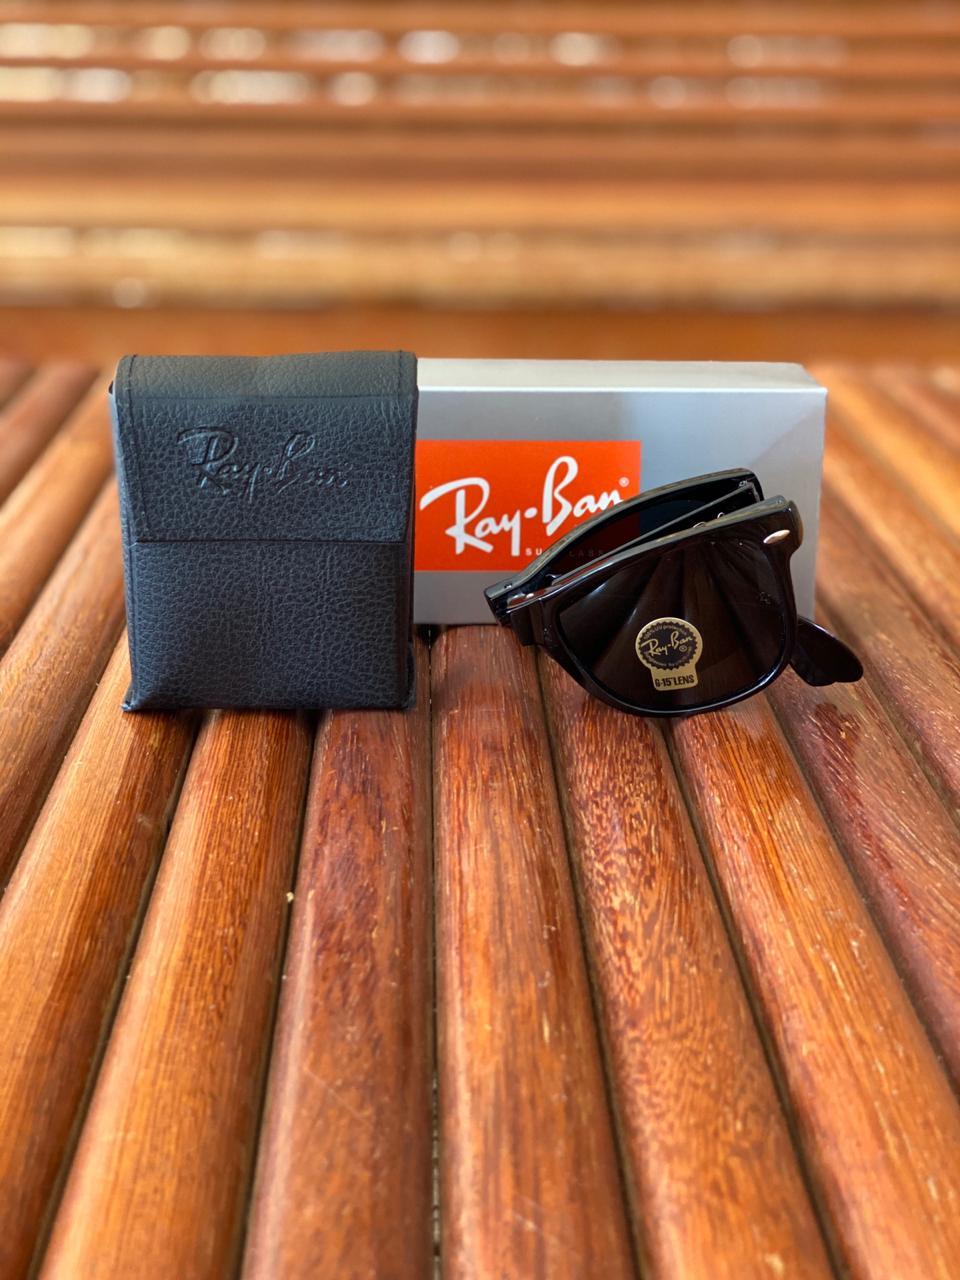 Oculos Ray ban RB1